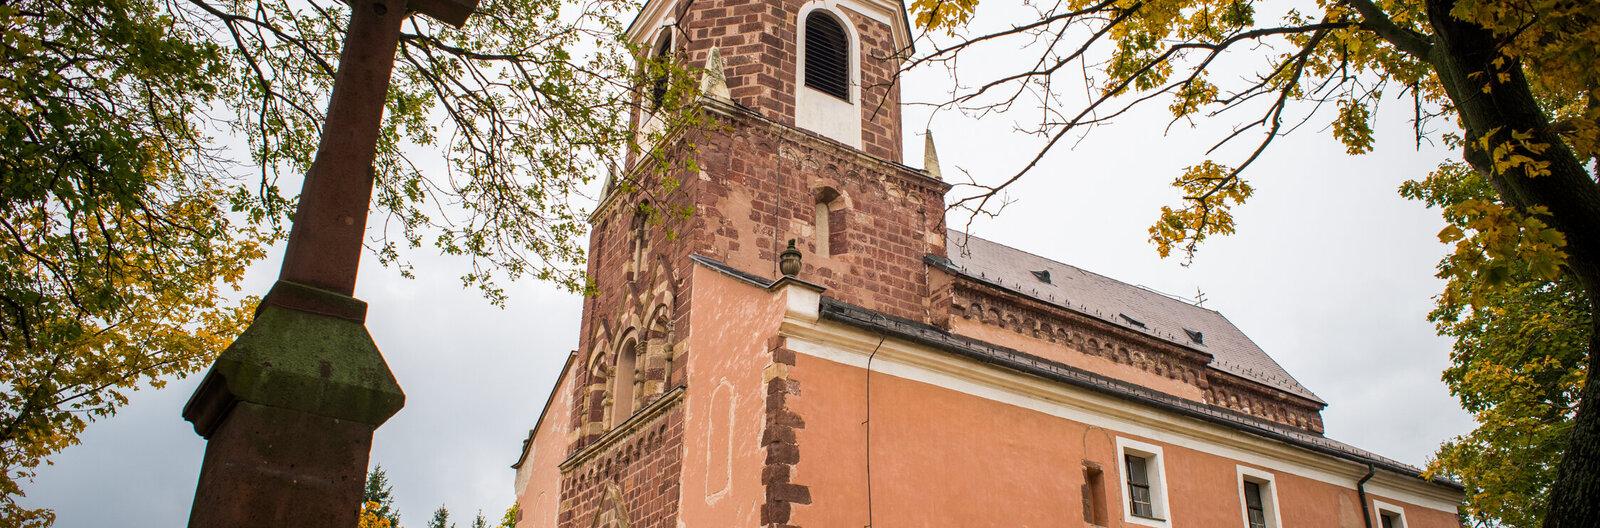 Beautiful Balaton churches from the Árpád era